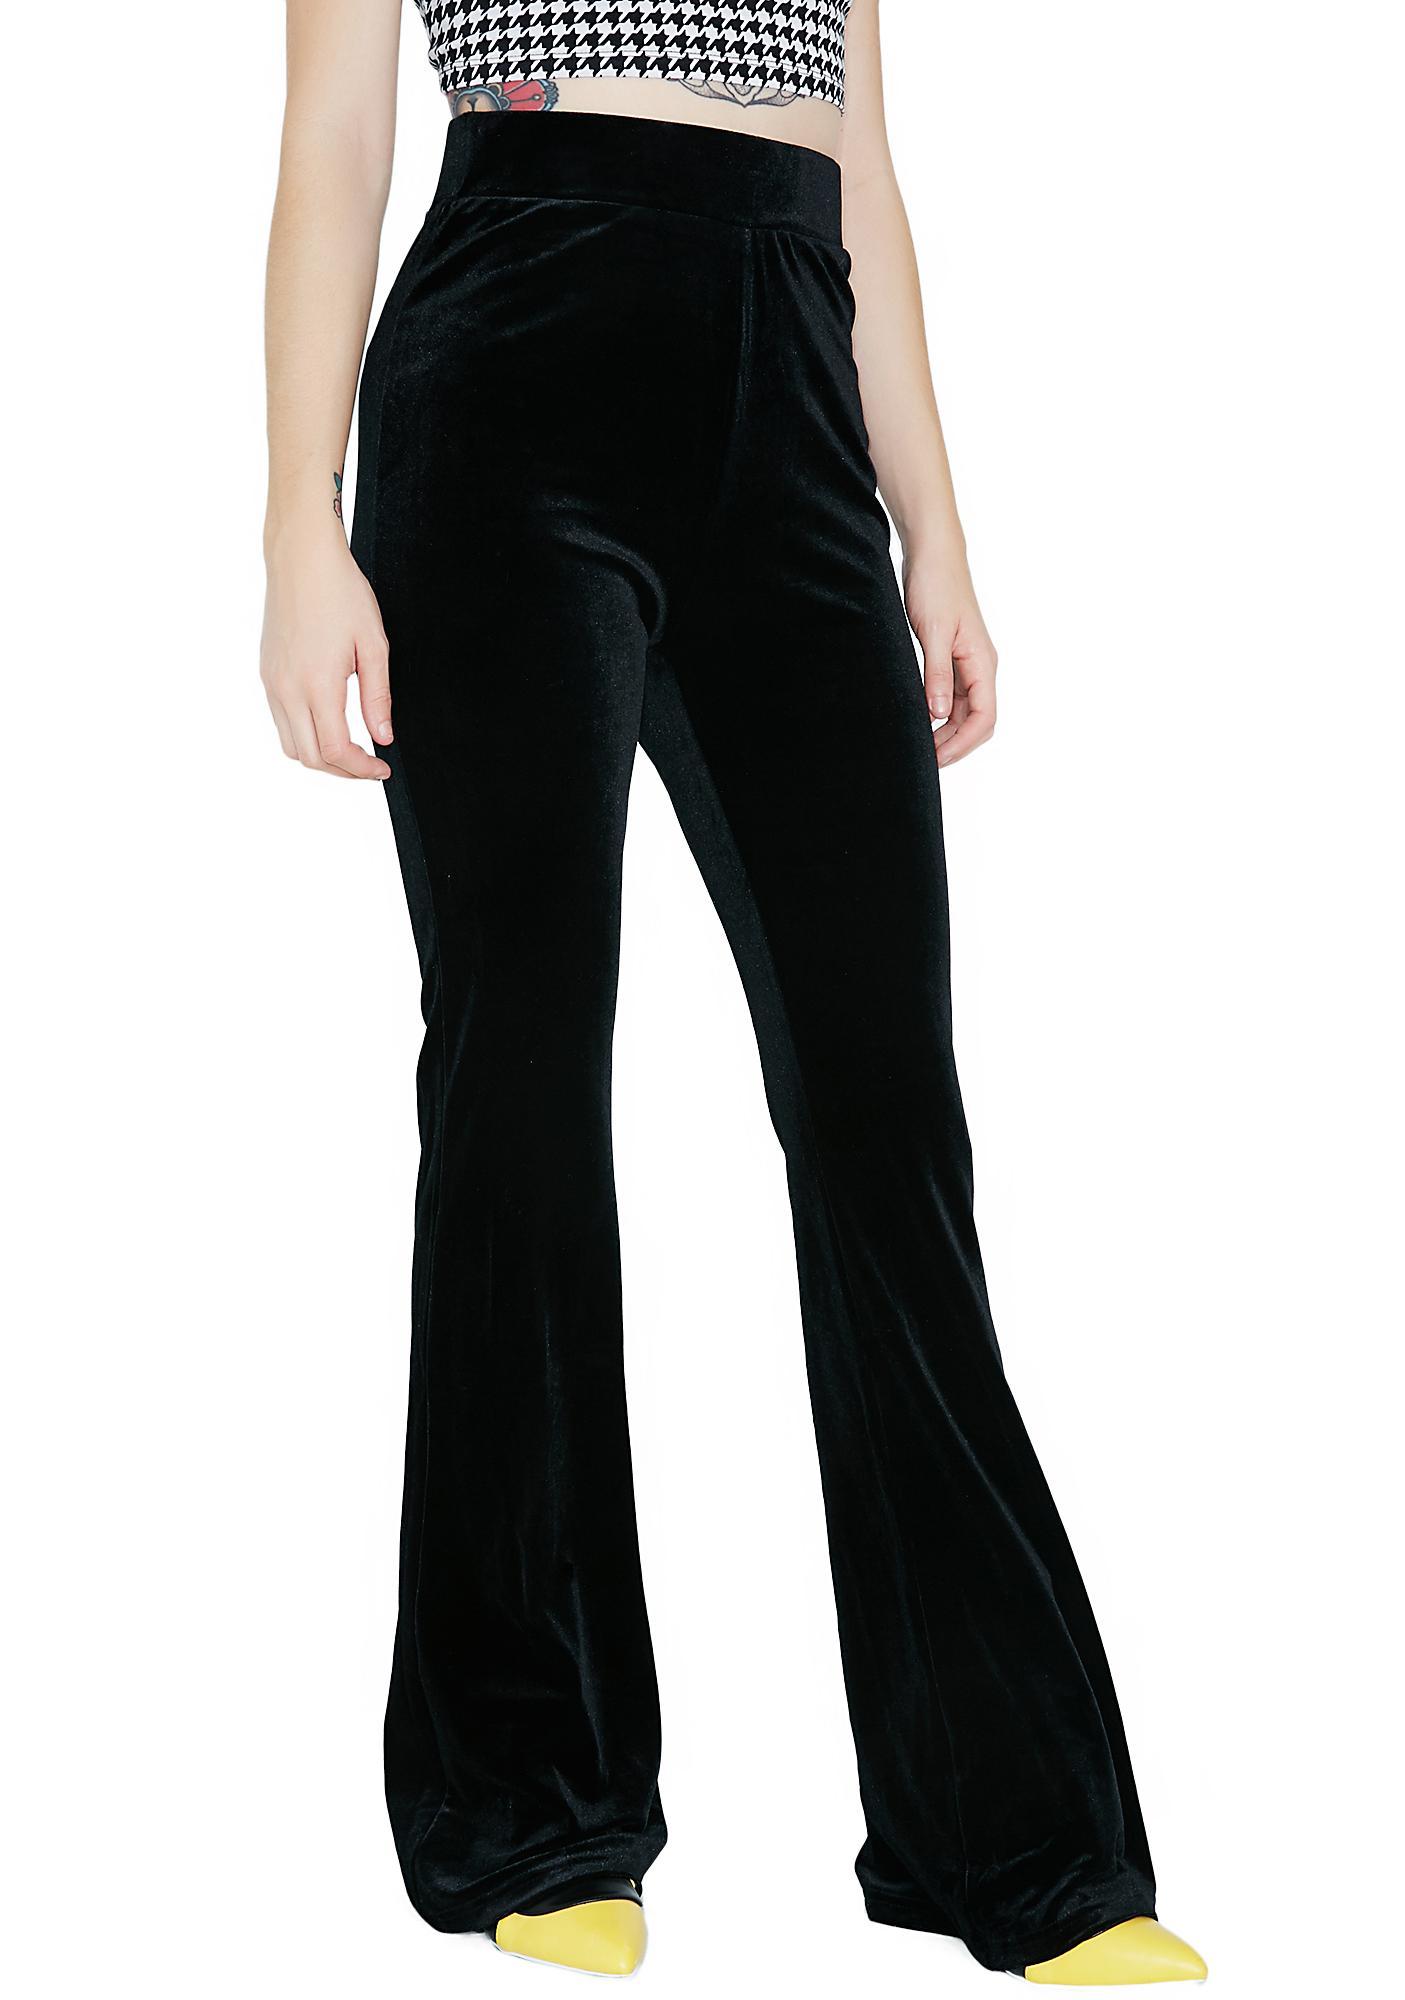 Midnight Persuasion Velvet Pants